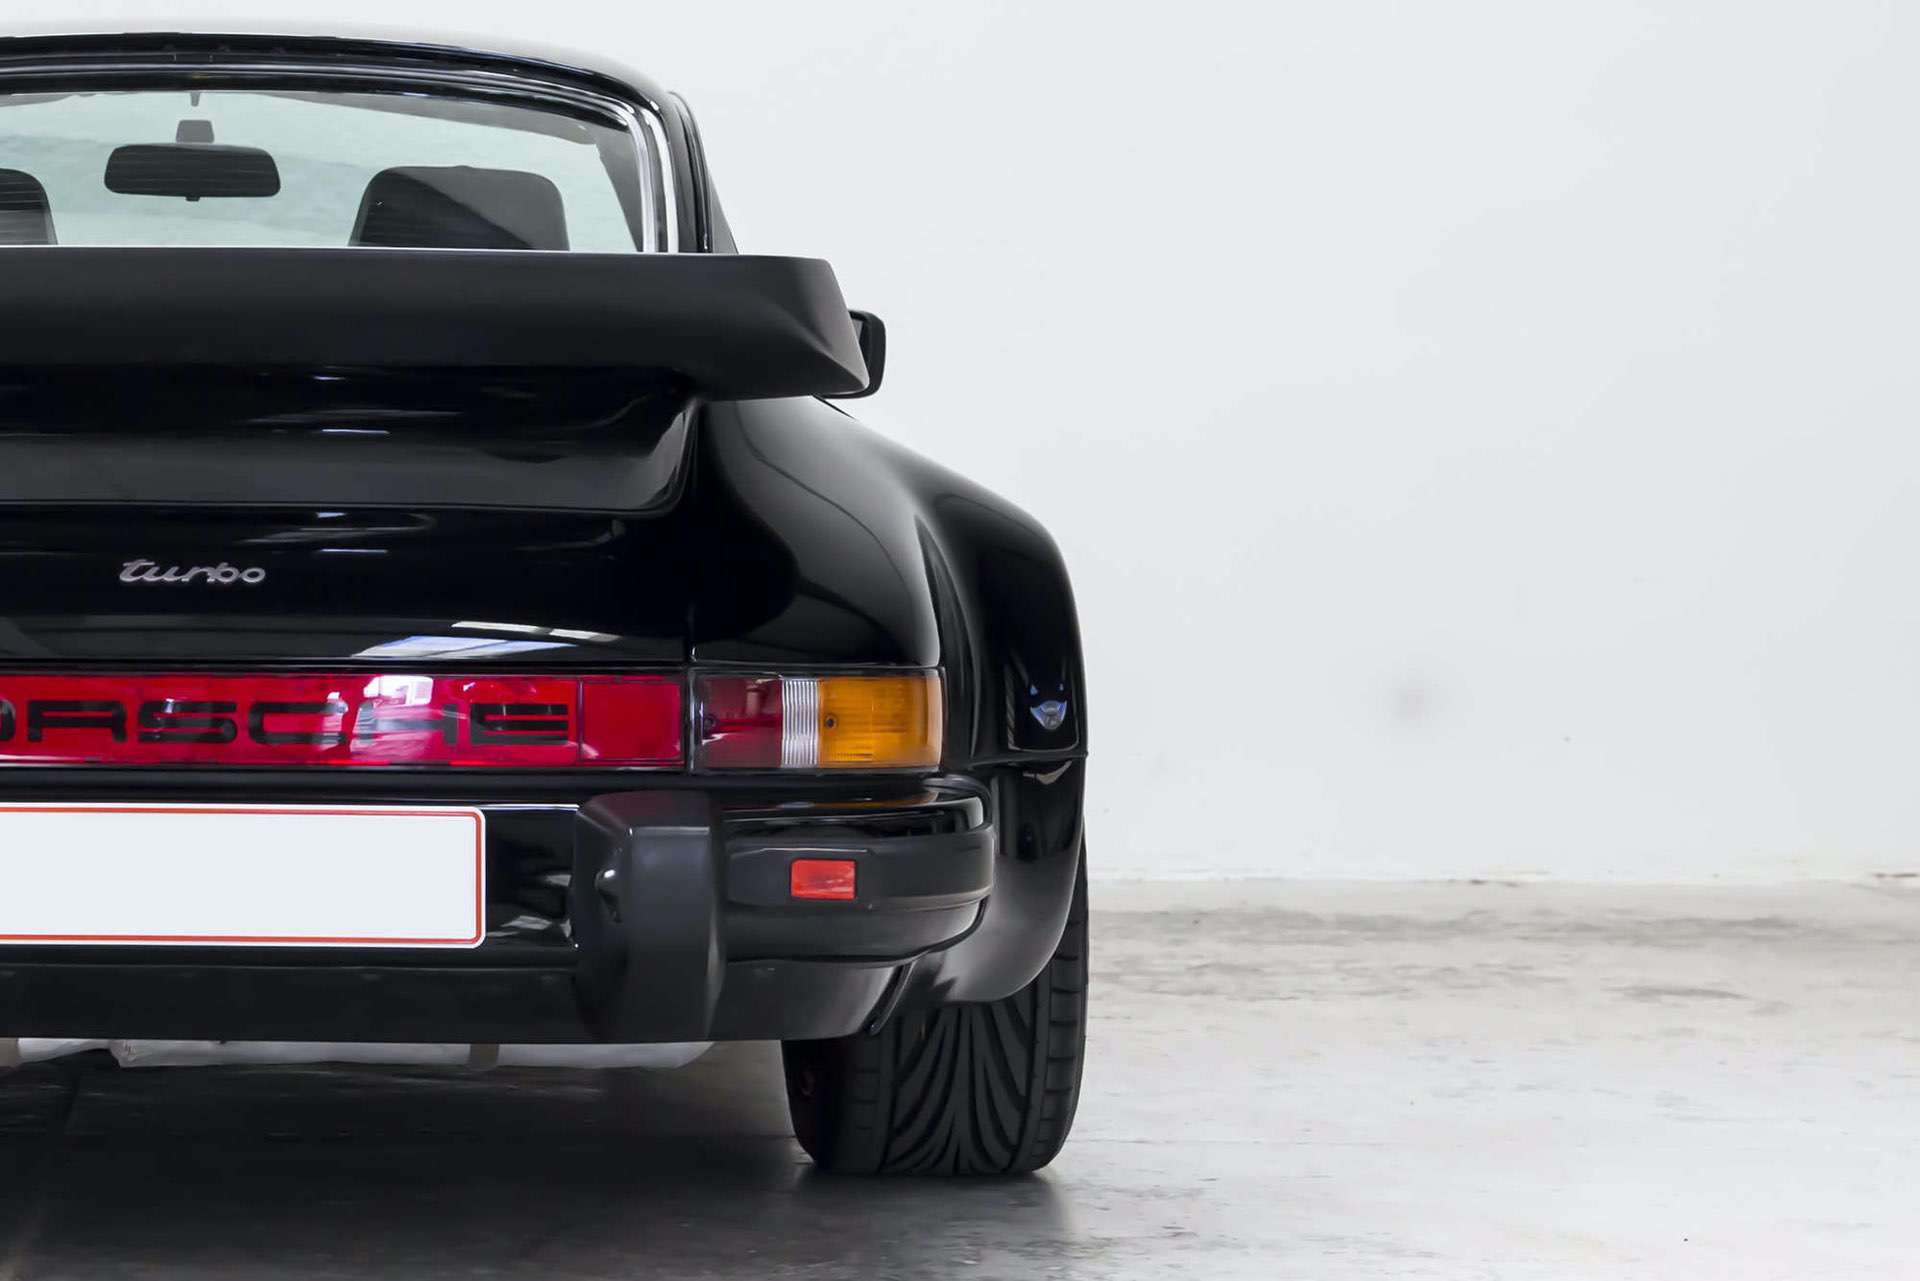 Porsche_911_930_Turbo_0012